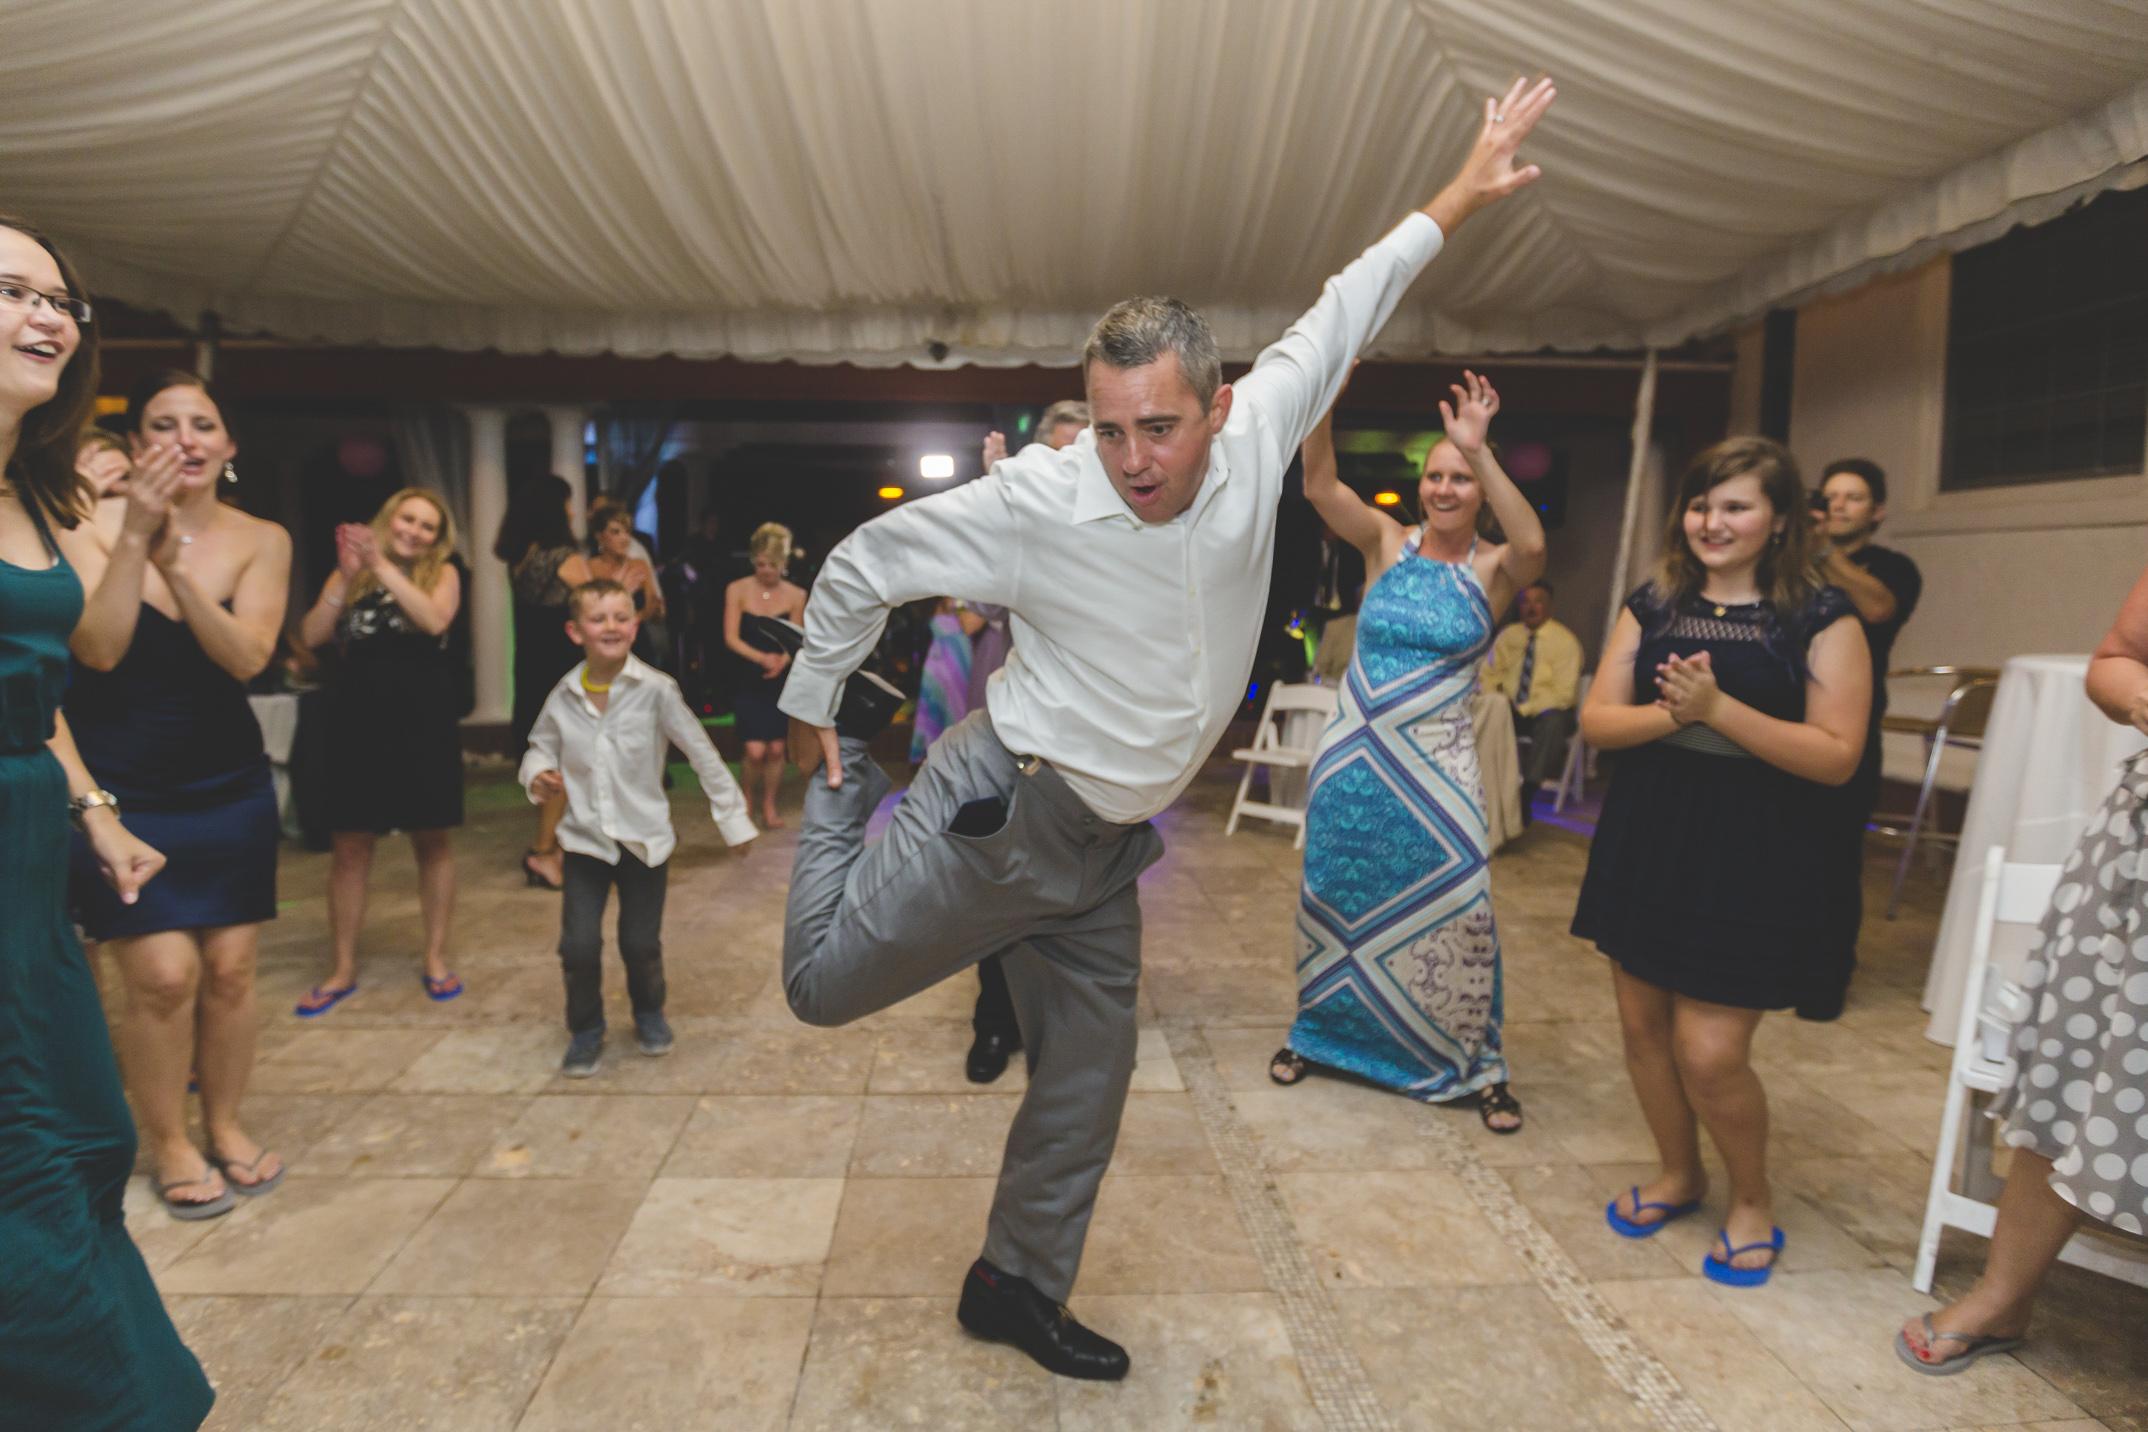 adam-szarmack-casa-marina-wedding-photographer-jacksonville-beach-florida-60.jpg